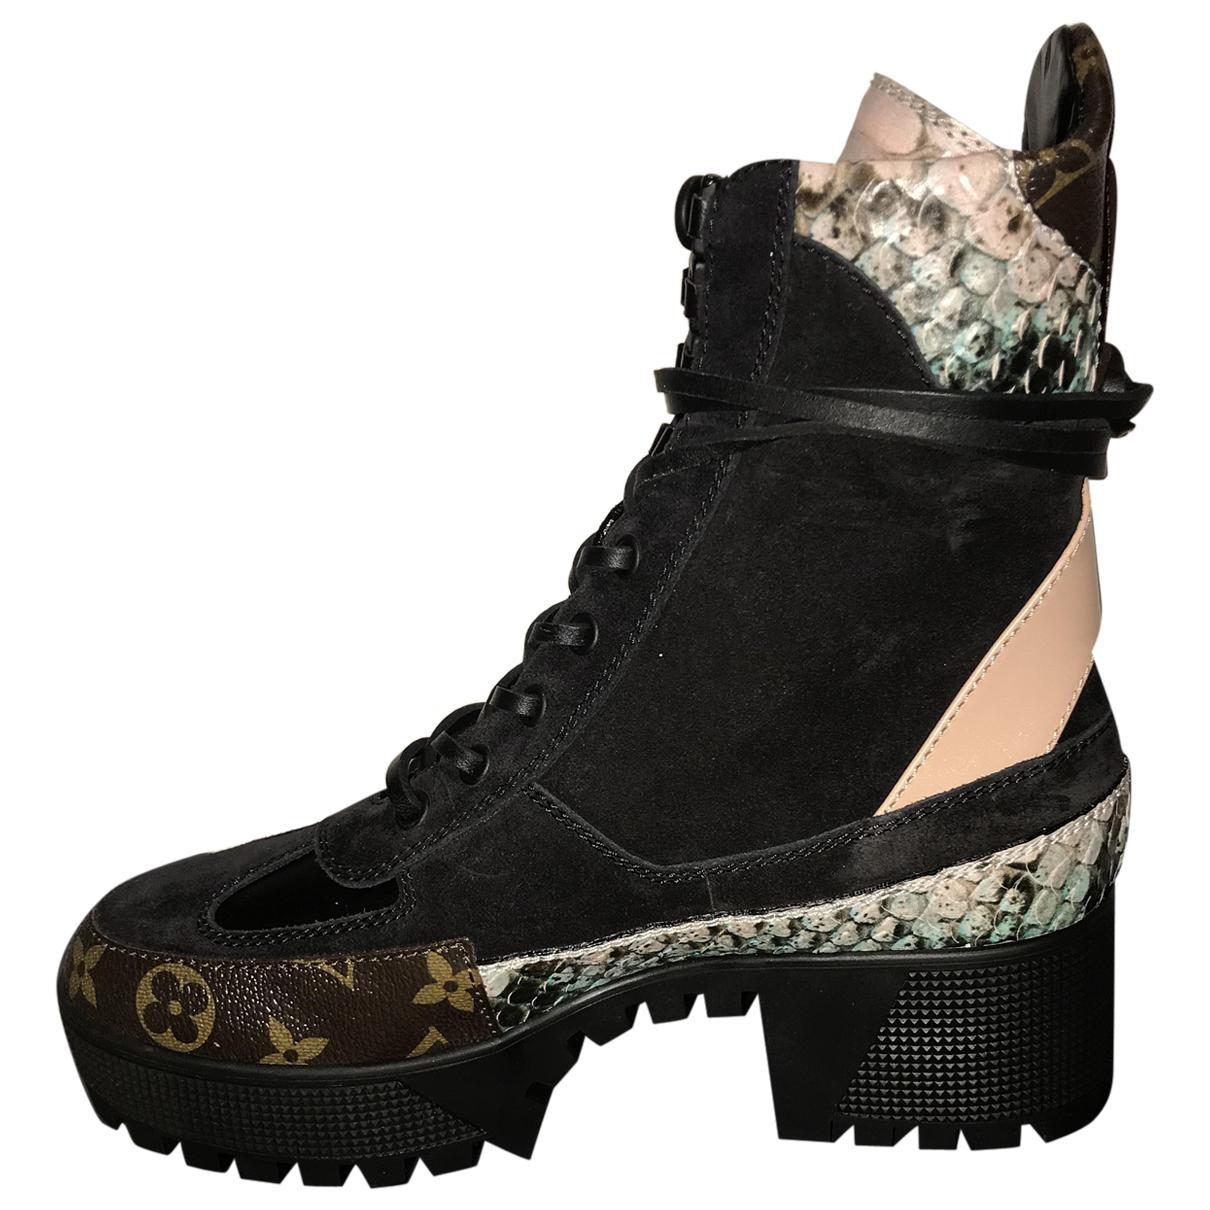 2a1ed78ce84e Louis Vuitton Laureate Lace Up Boots in Black - Lyst